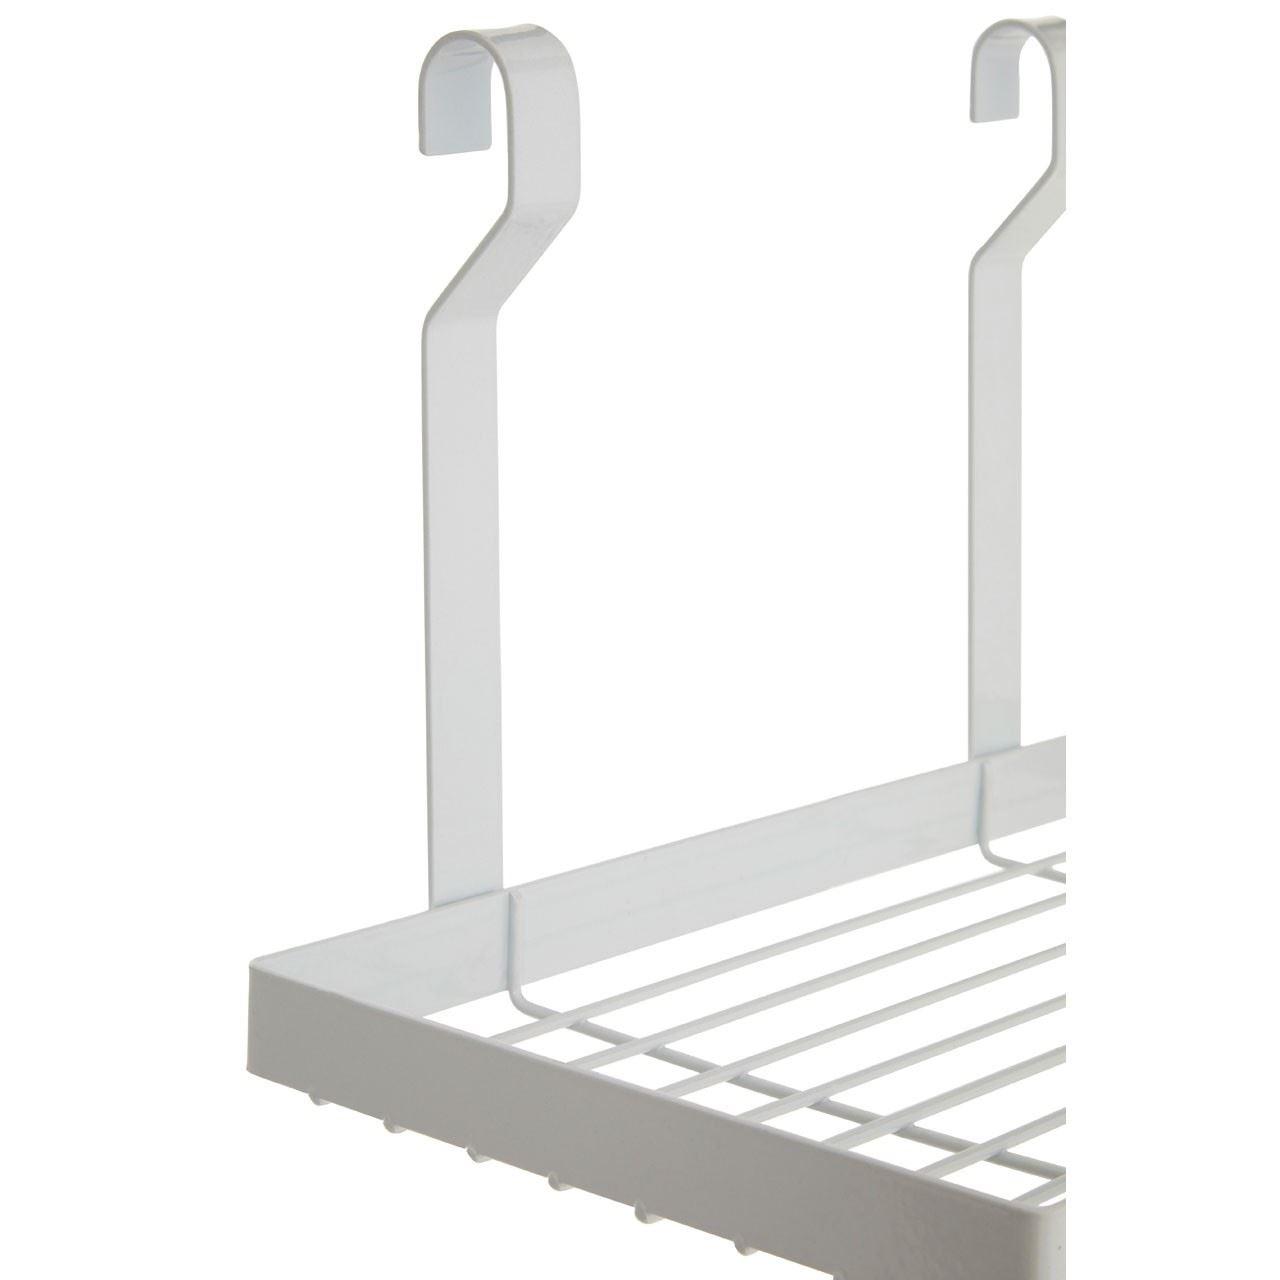 Iron White Hanging Storage Rack Hanging Cylindrical Rail and Hanging Hook